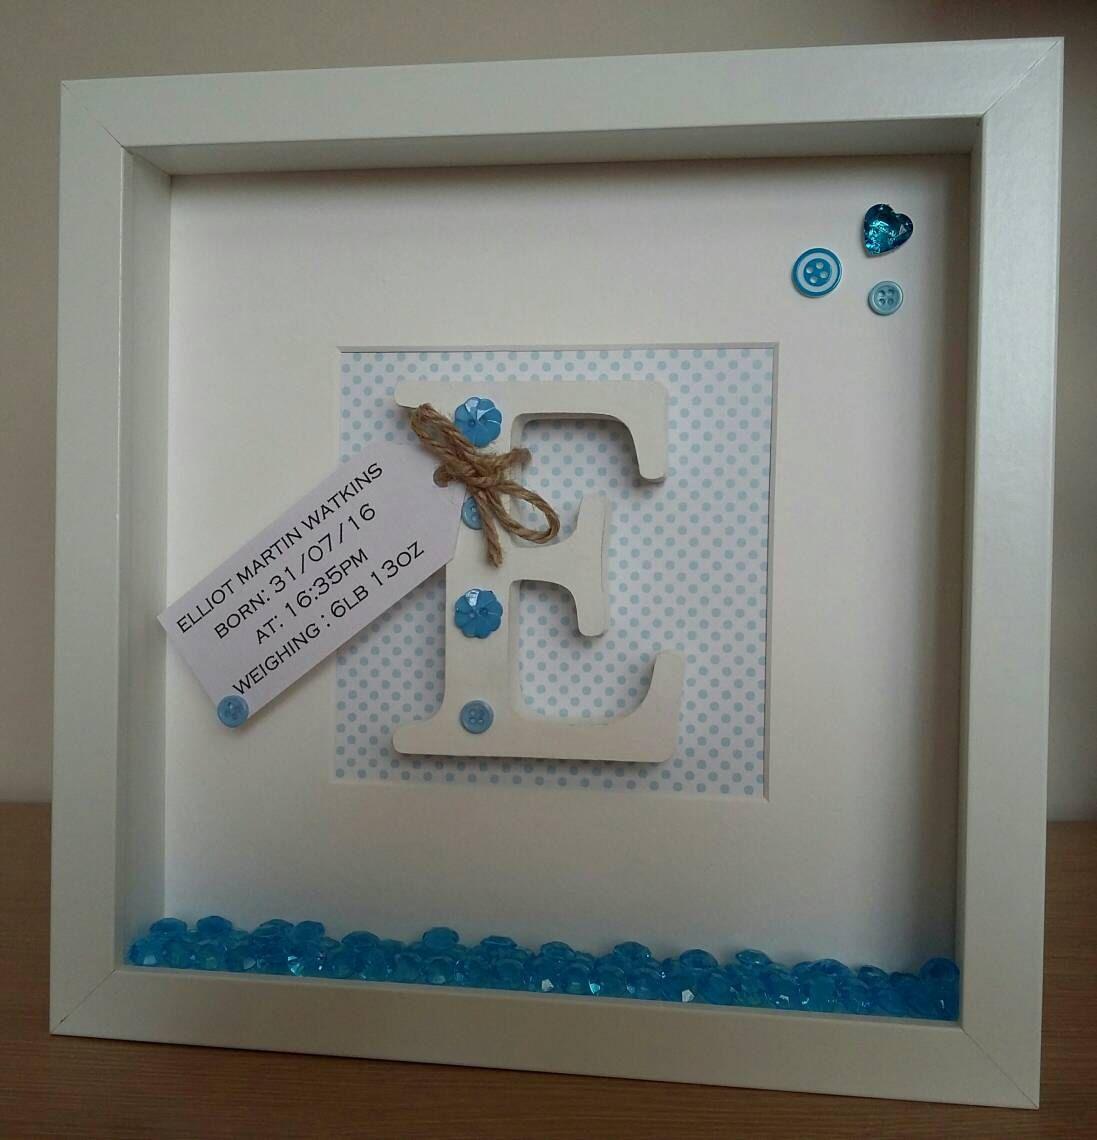 Scrabble Names Wall Art Scrabble Wall Art Baby Boy Girl Namechristening Gift New Baby